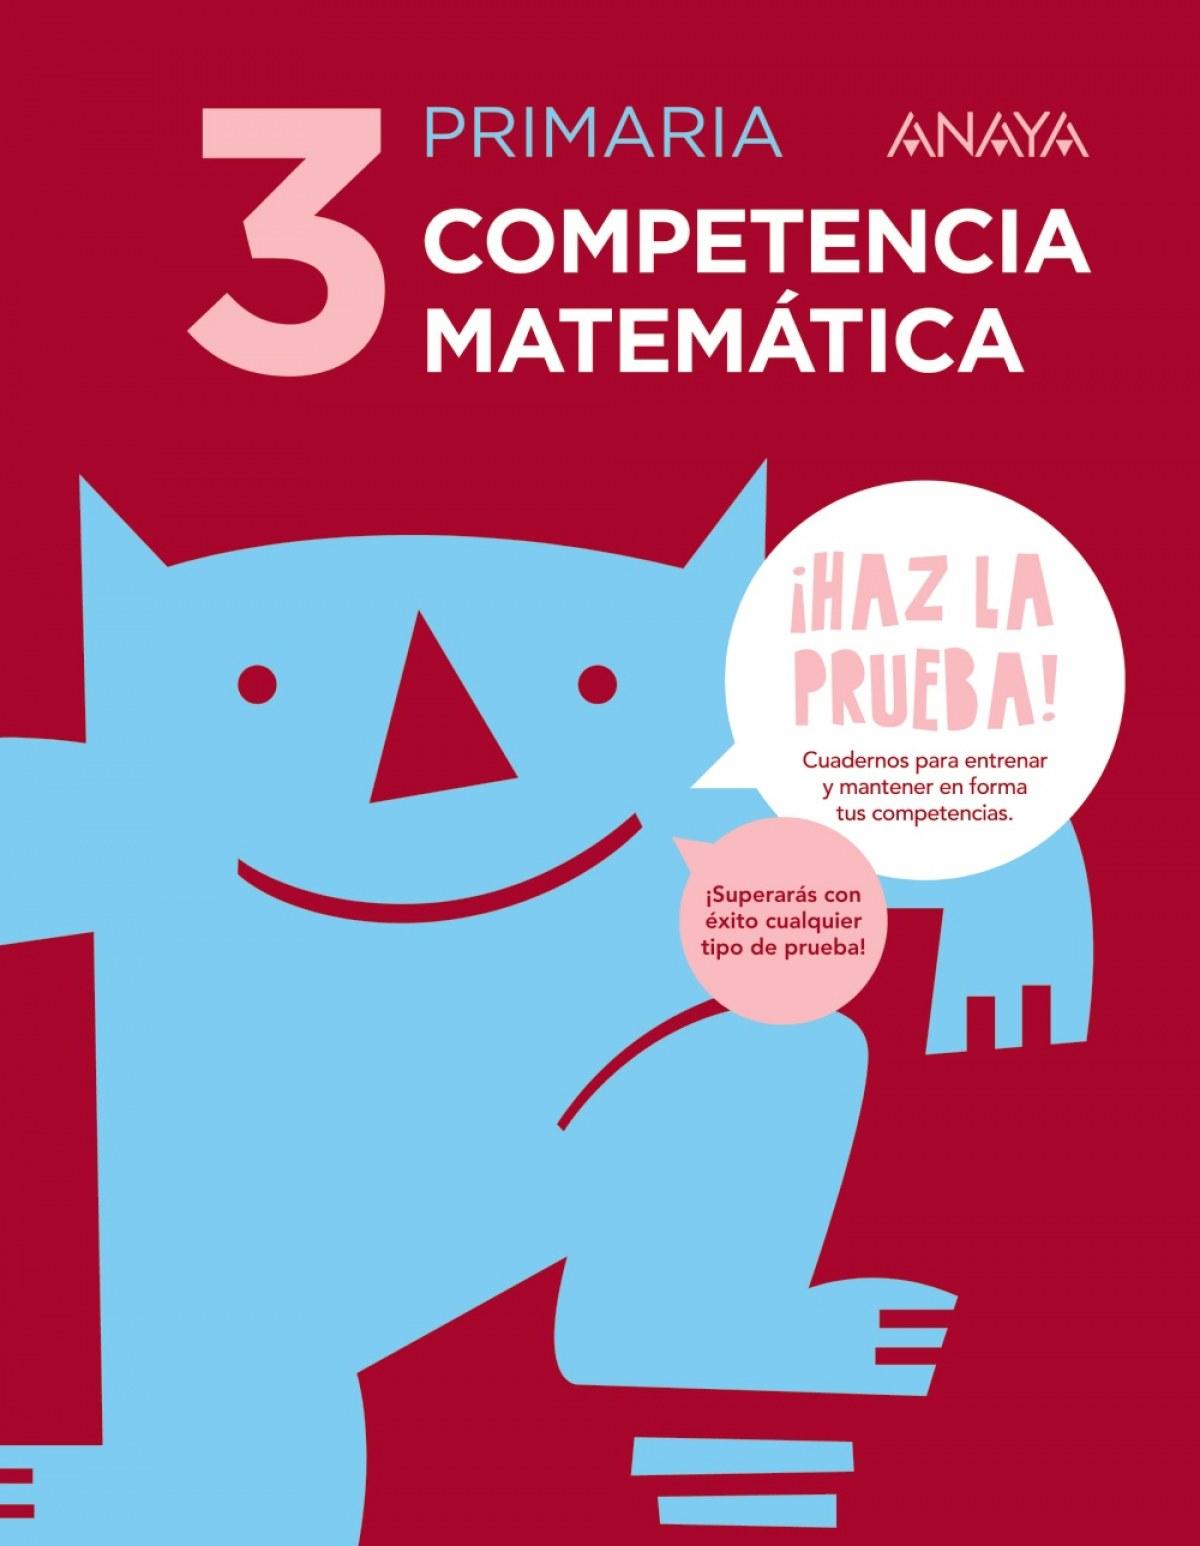 CUADERNO COMPETENCIA MATEM-TICA 3 9788469831359